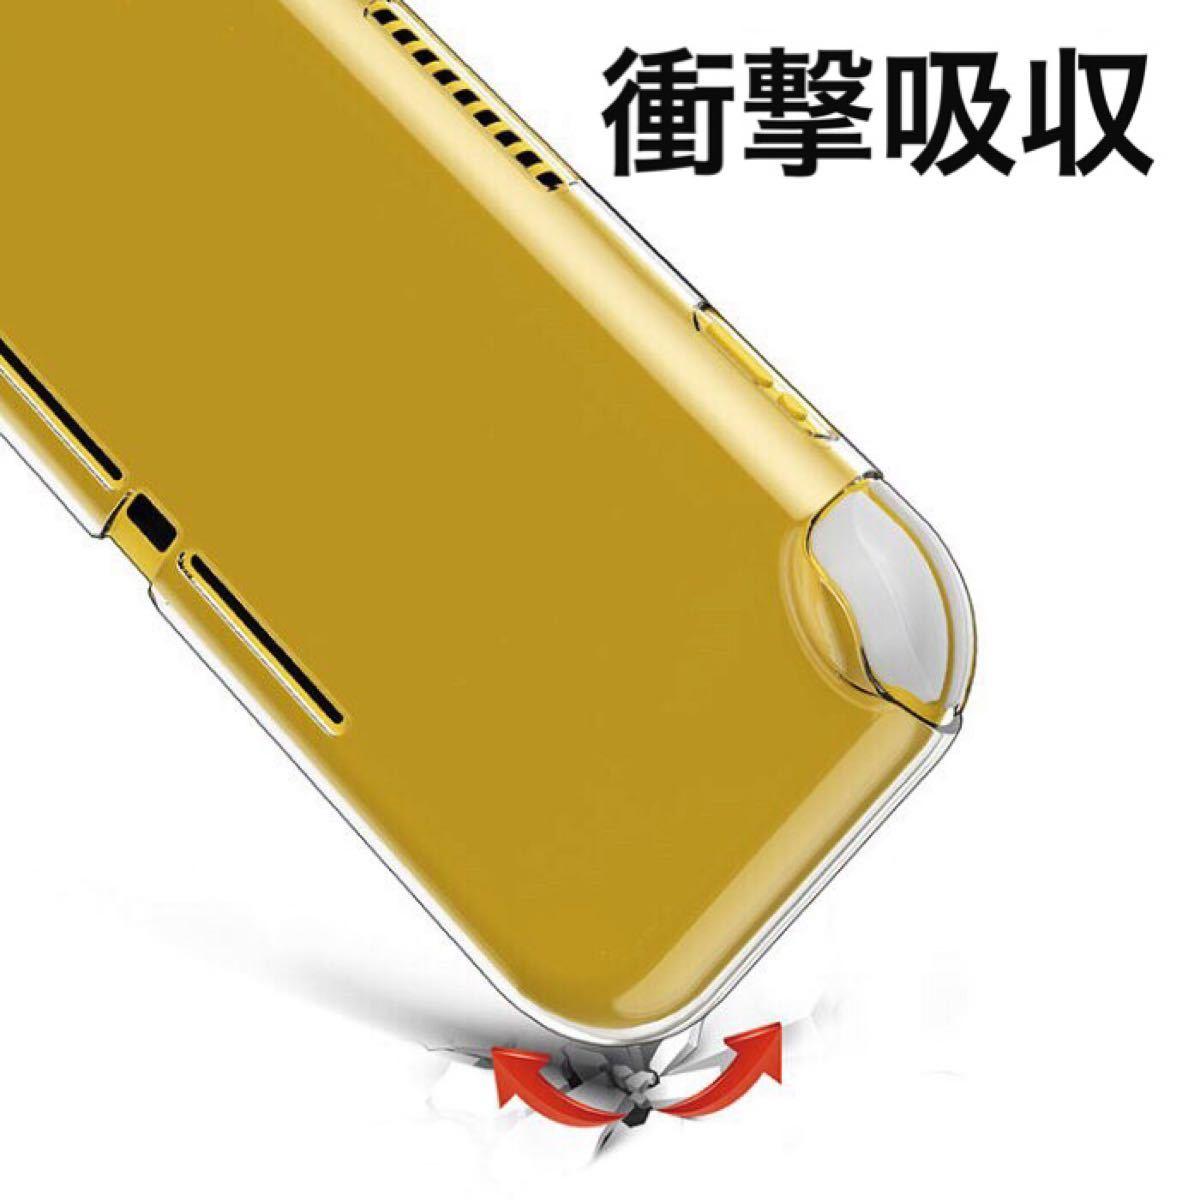 Nintendo Switch Lite クリアソフトケース TPU 透明カバー 新品未使用 スイッチライト シンプル